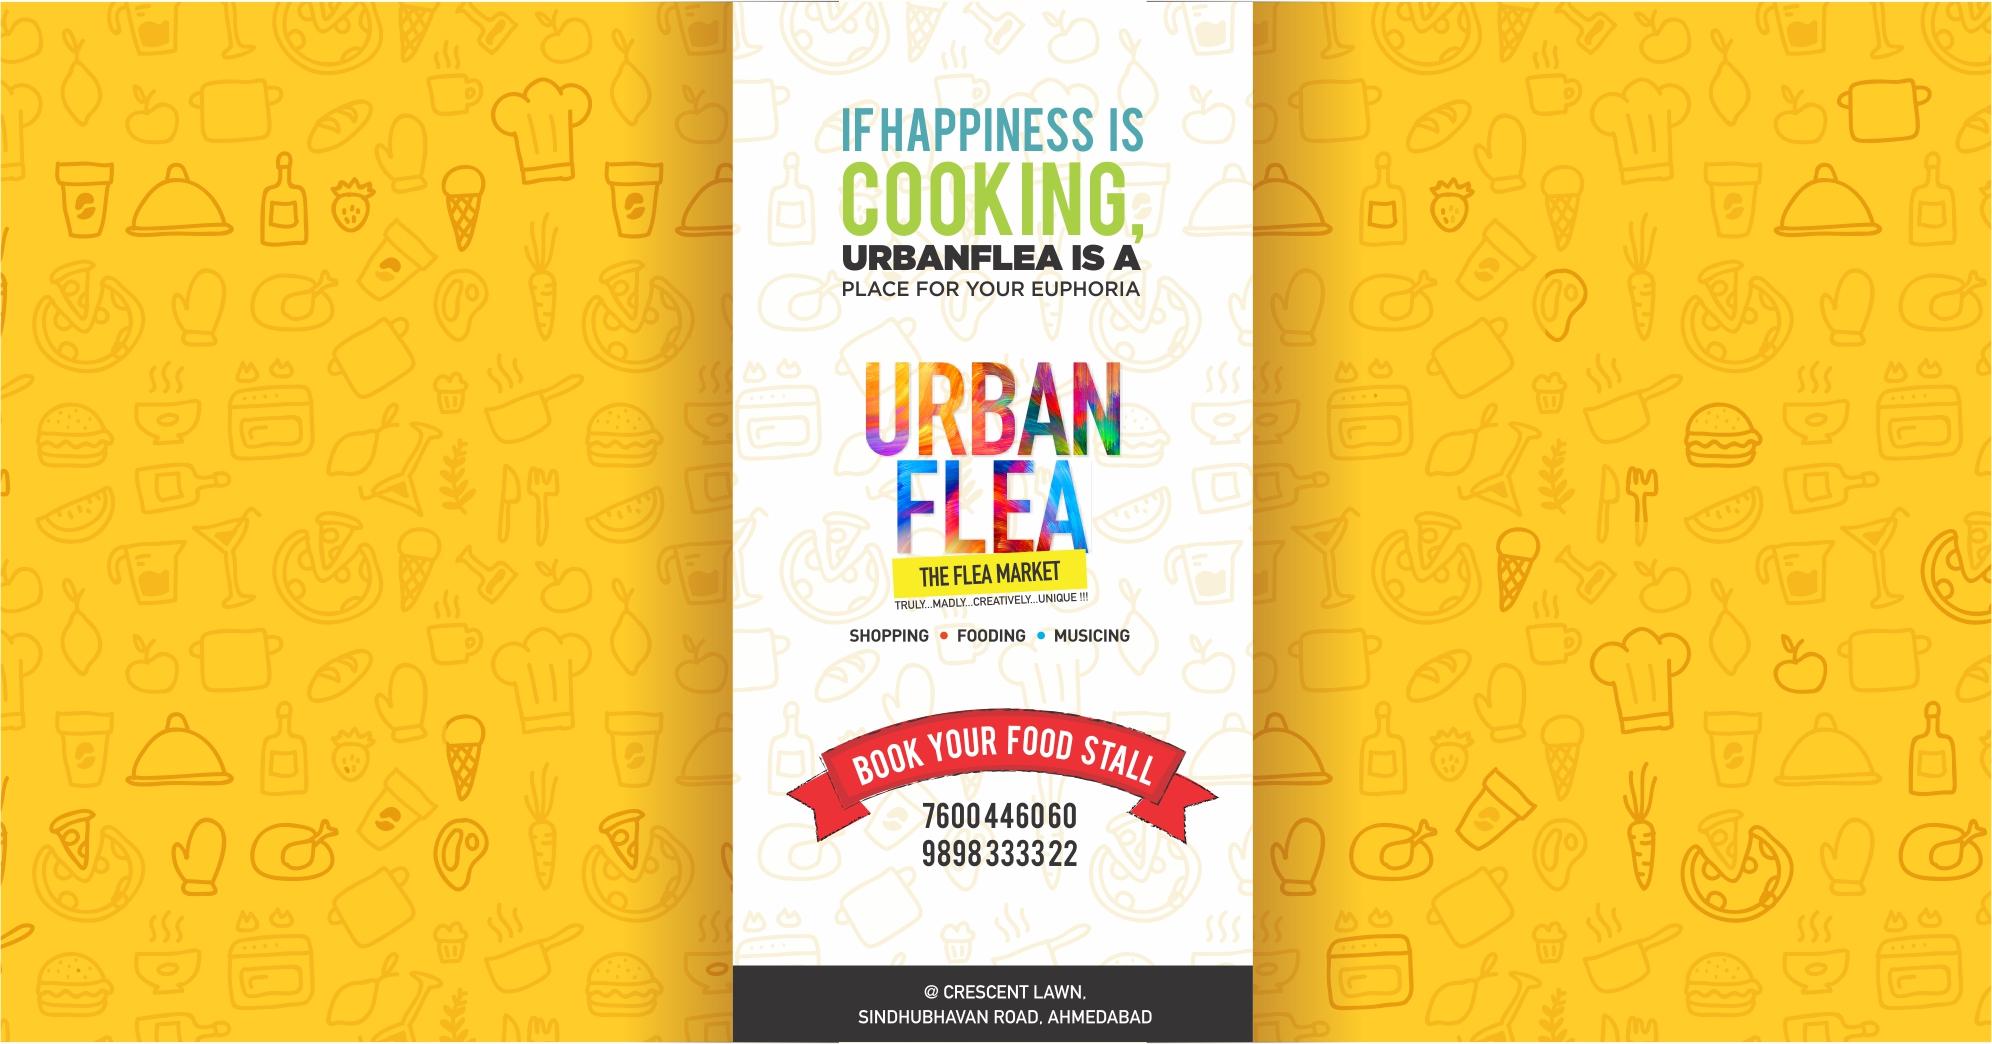 URBAN FLEA starts tomorrow!